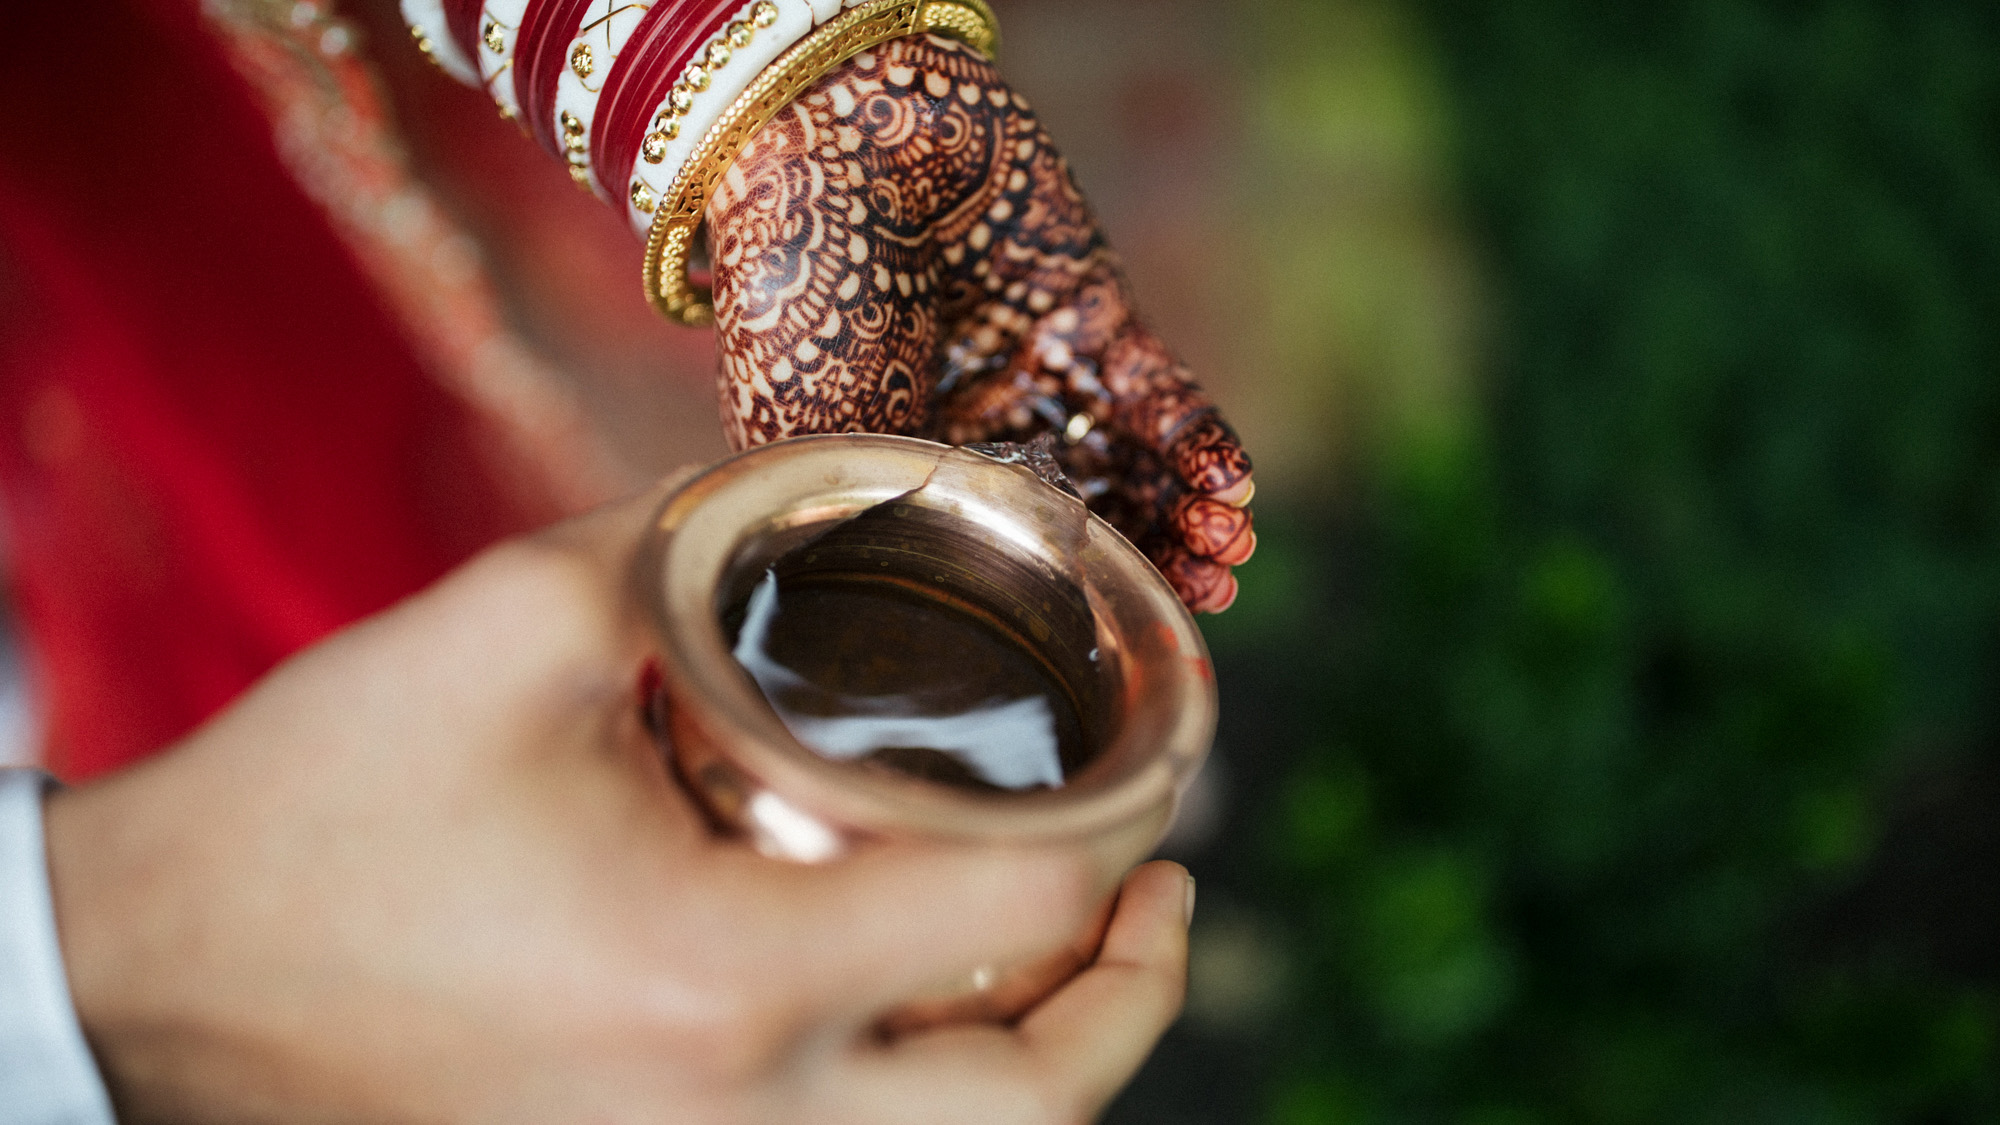 anu_maneesh_alec_vanderboom_Indian_wedding_photography-0203.jpg